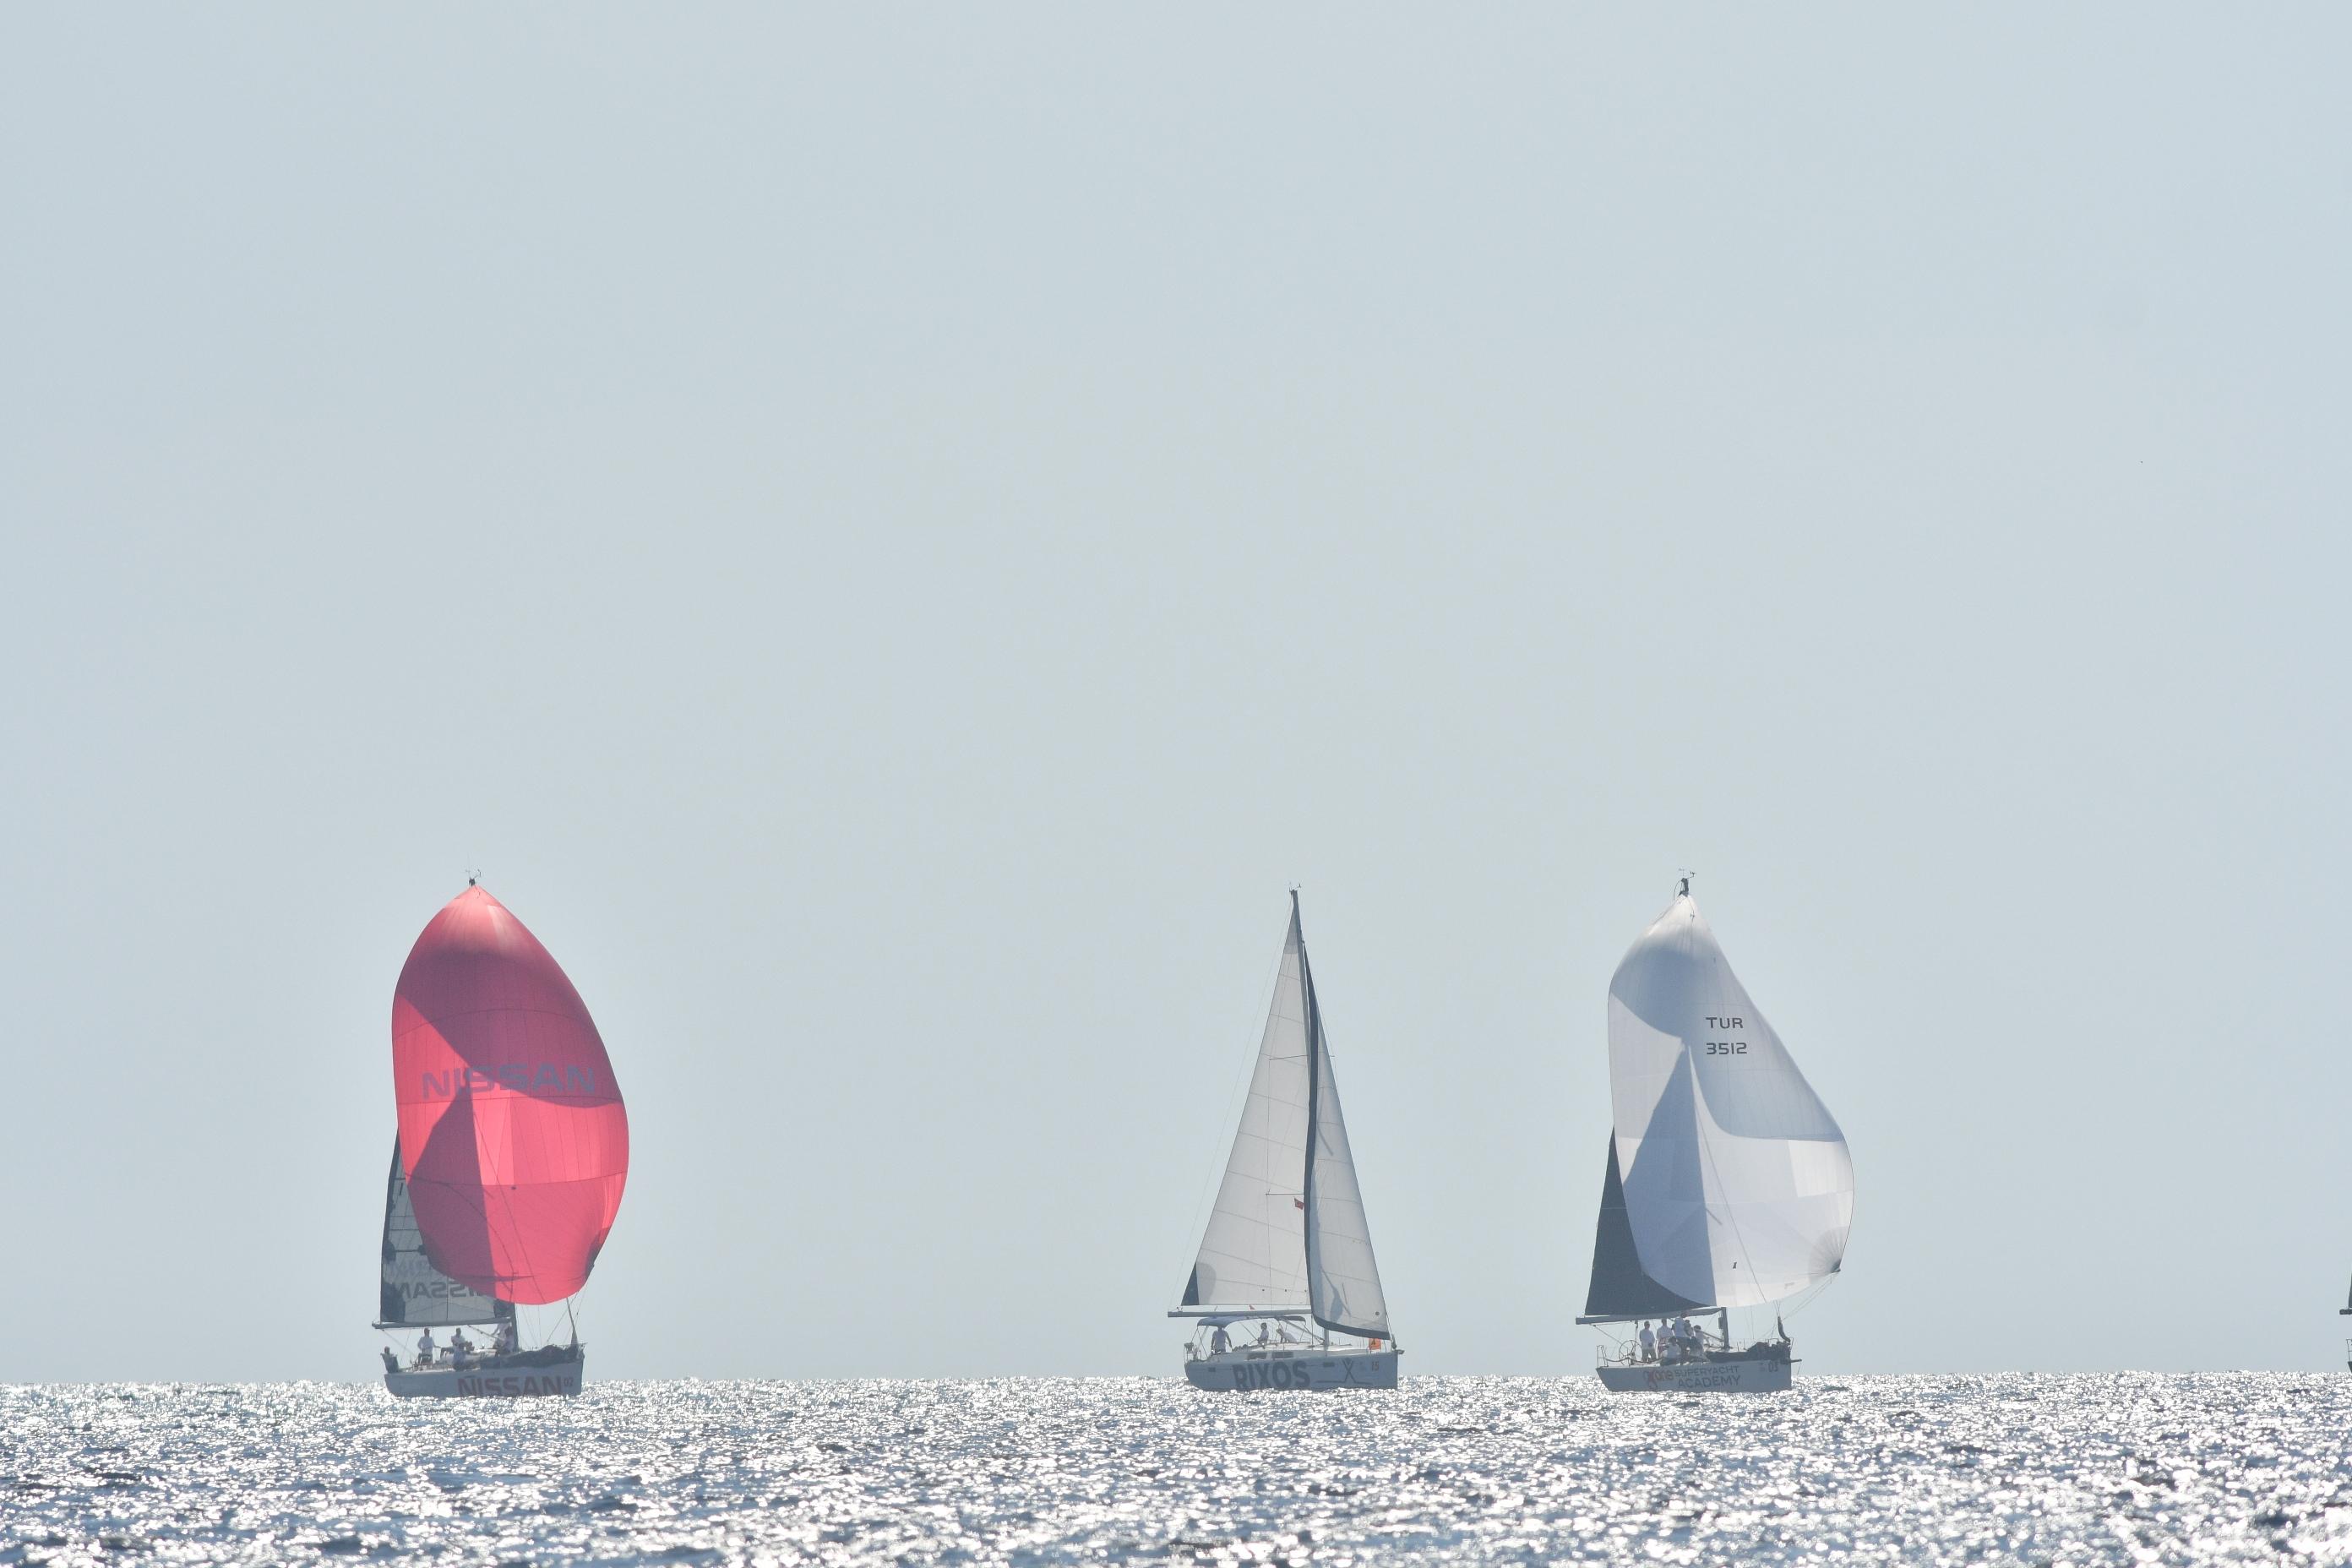 1539600563_rixos_sailing_cup_gocek_2018_4.jpg